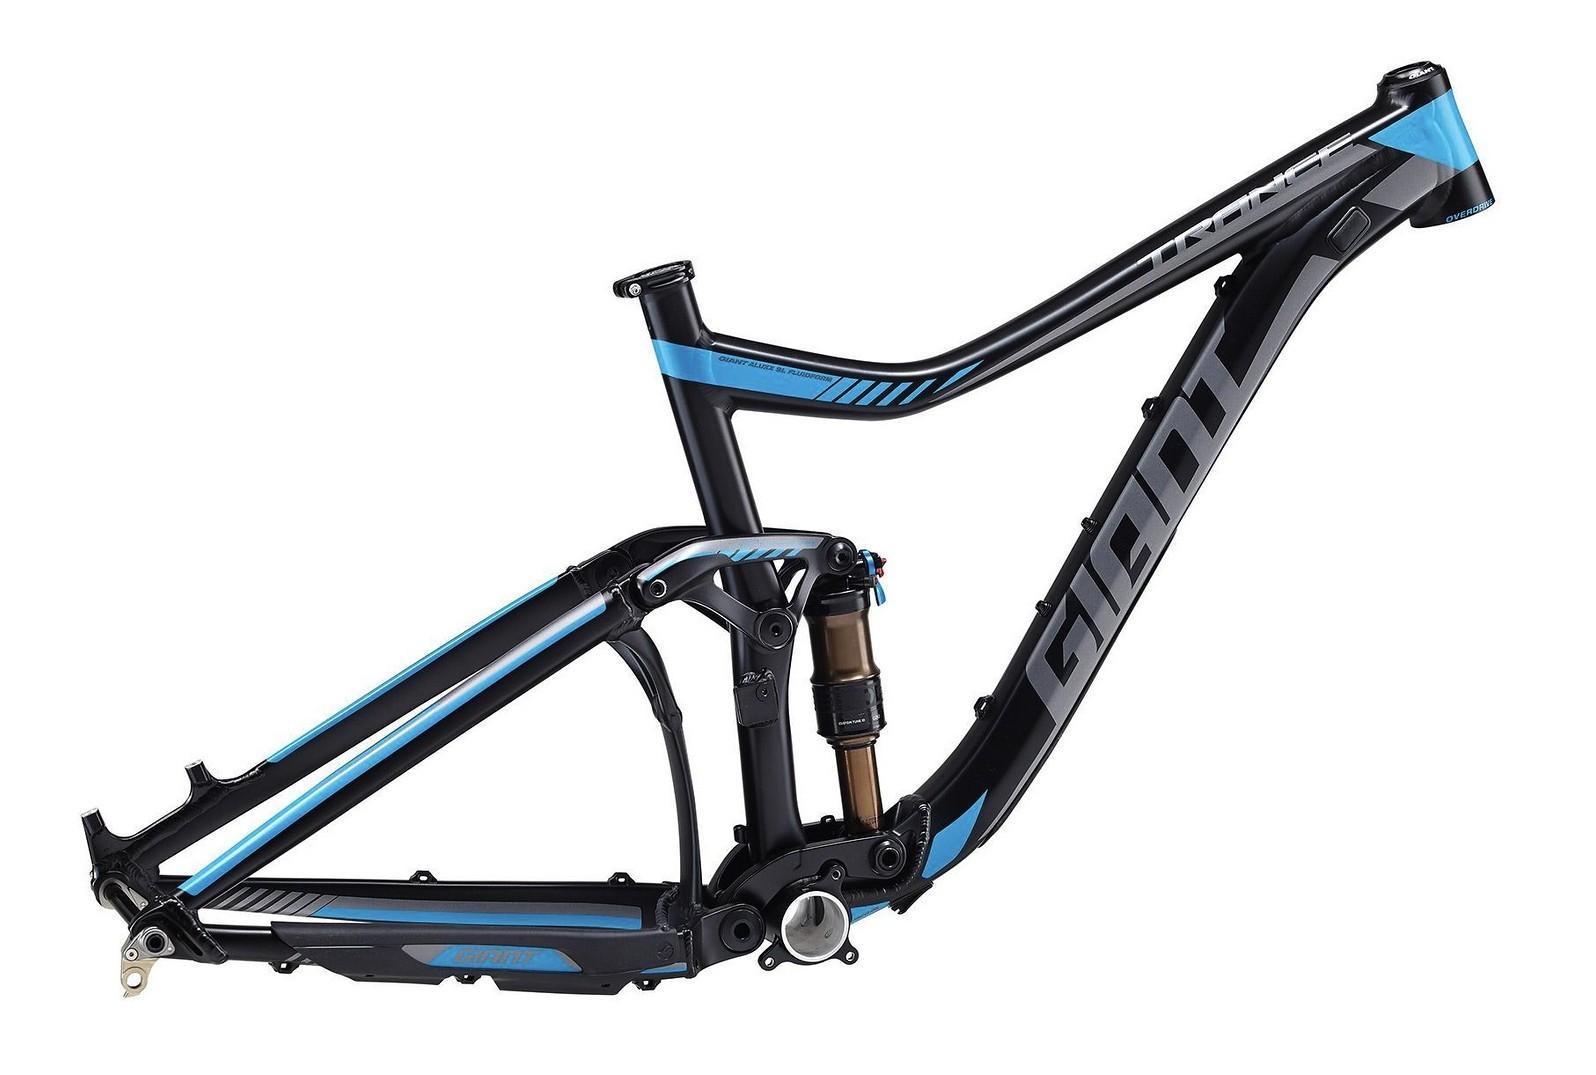 Continental Bike Tires >> Giant Trance Aluxx 27.5 - 2016 Frame - Reviews, Comparisons, Specs - Mountain Bike Frames ...